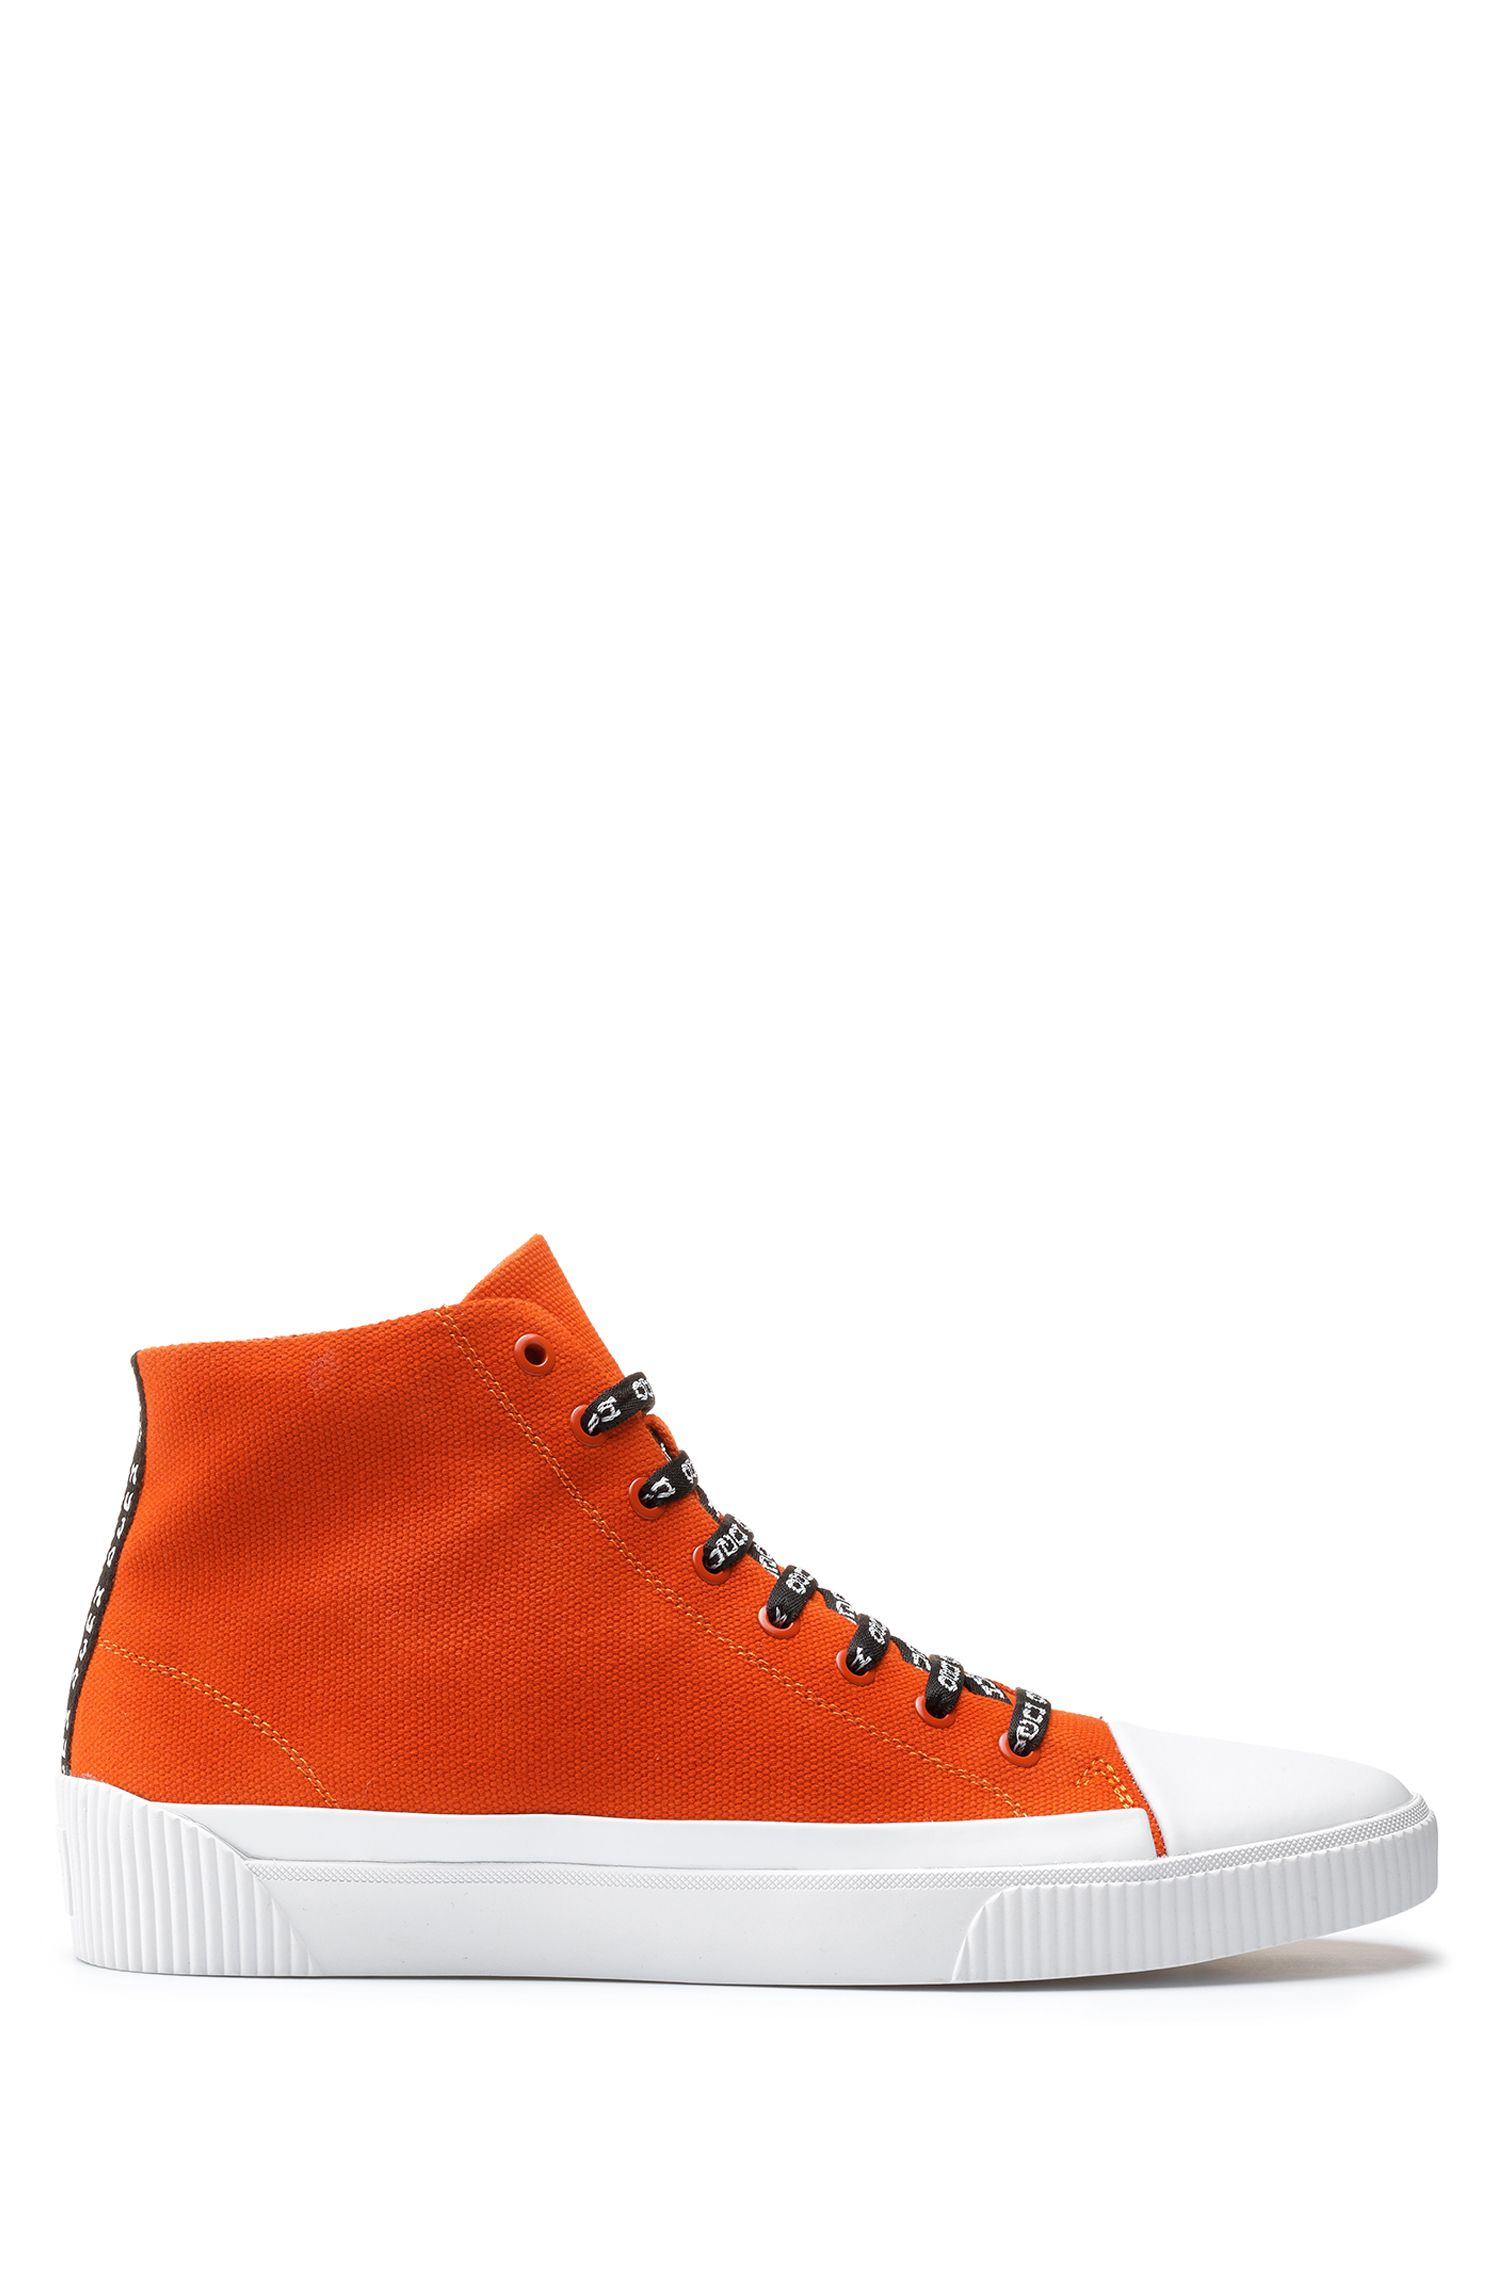 Sneakers high-top in tela con stringhe con logo reversed, Arancione